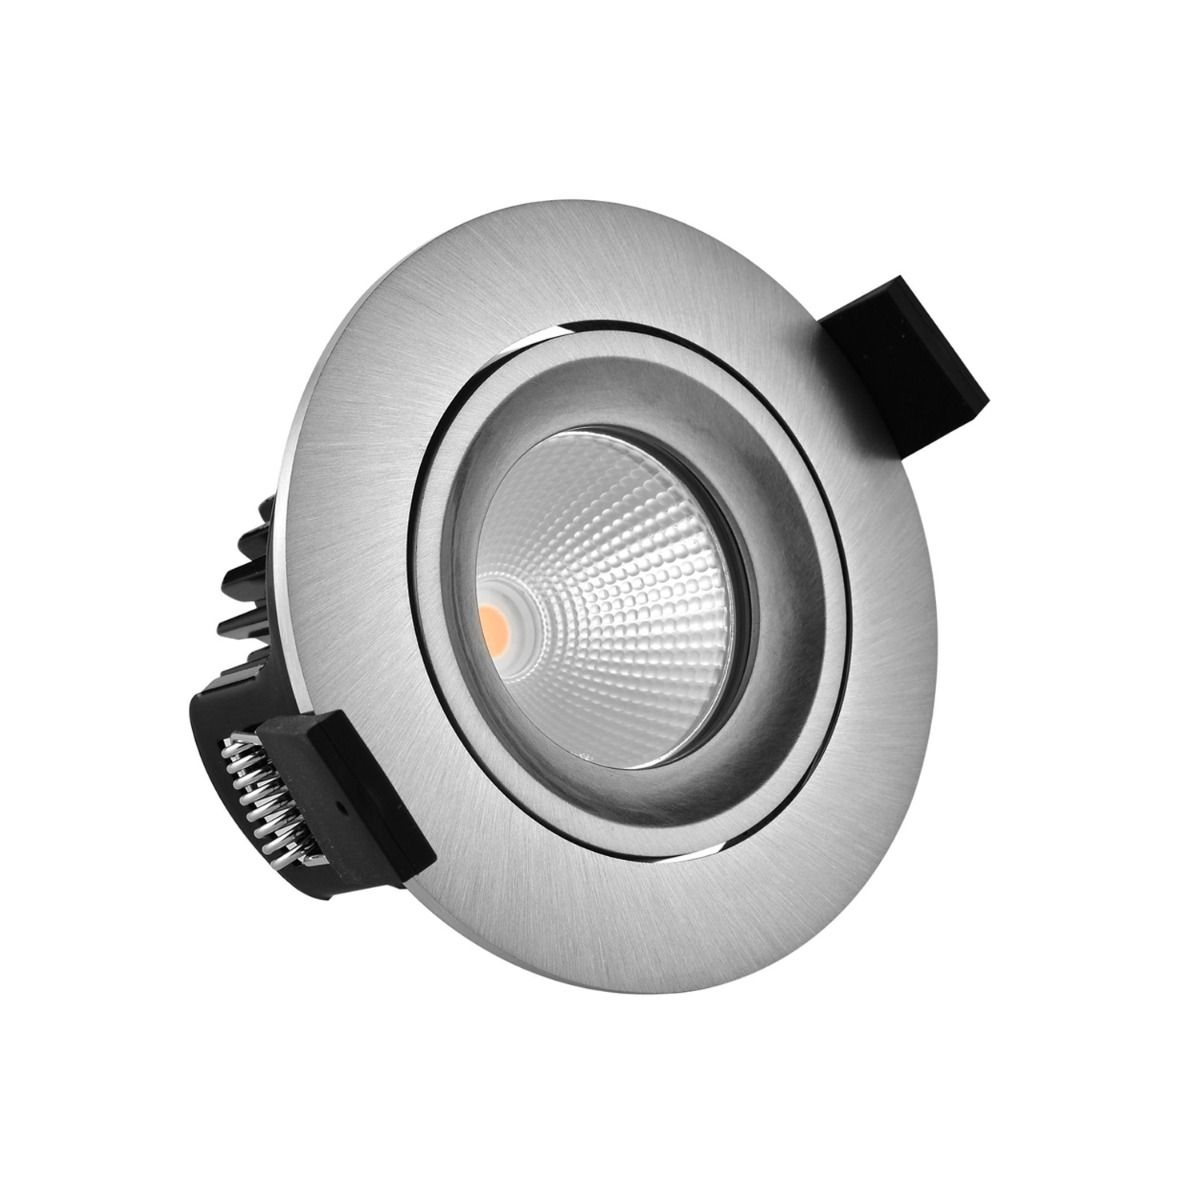 Noxion LED Strahler Hydro IP65  Aluminium 2700K 6W | Beste Farbwiedergabe - Dimmbar